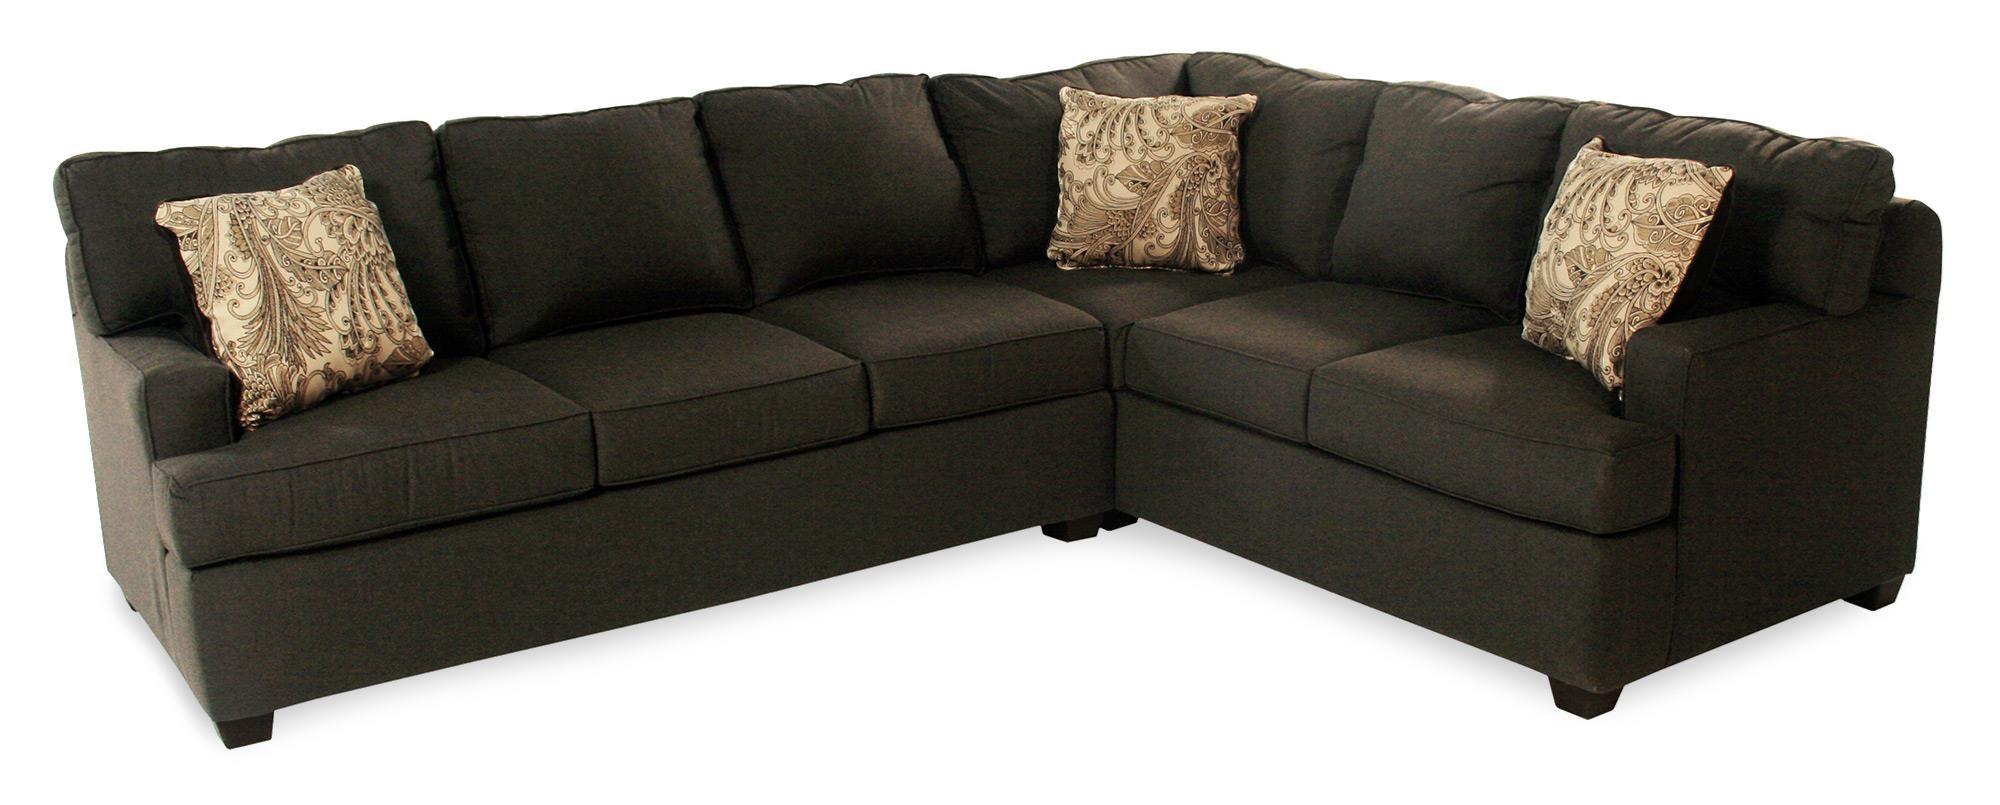 sunbrella fabric sectional sofas fulton tan microfiber convertible sofa bed julep two piece corner w rotmans